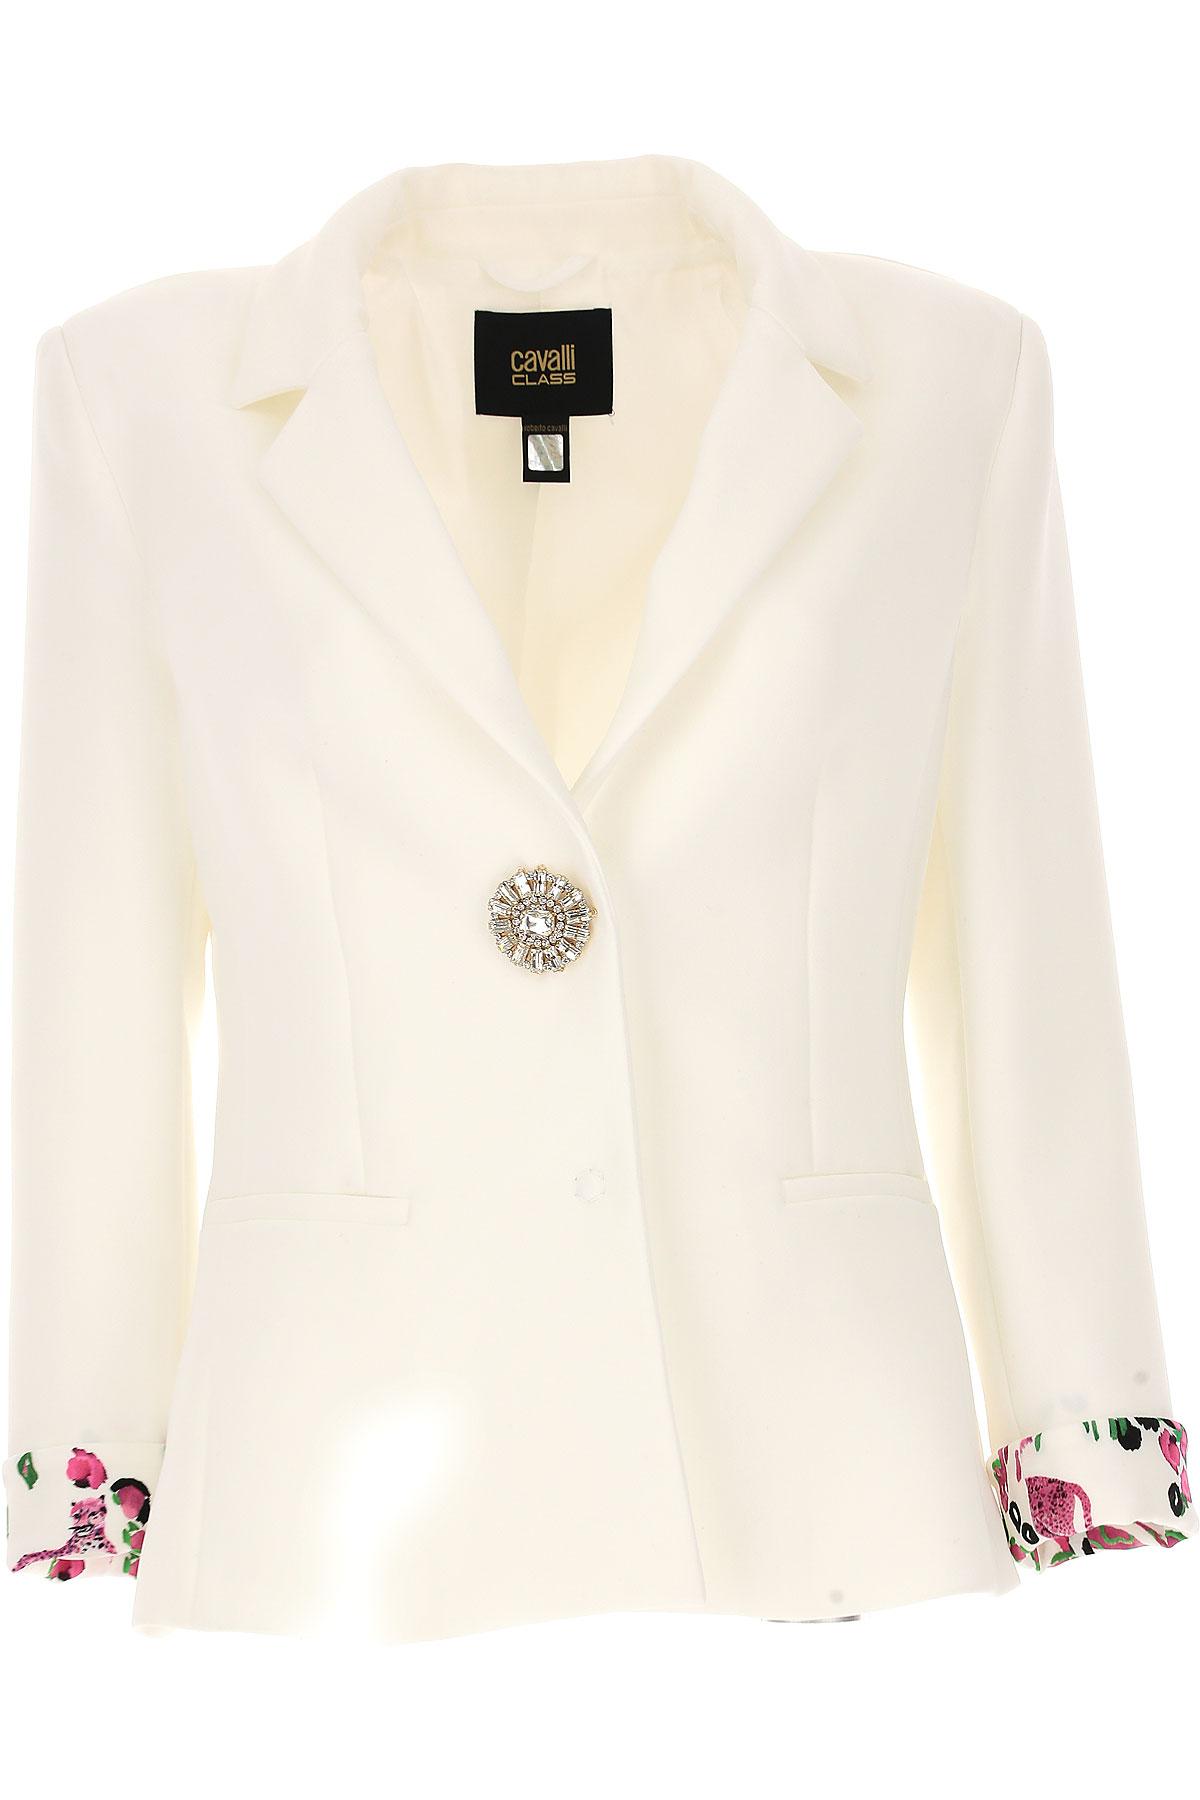 Image of Roberto Cavalli Blazer for Women On Sale, White, polyester, 2017, 10 4 6